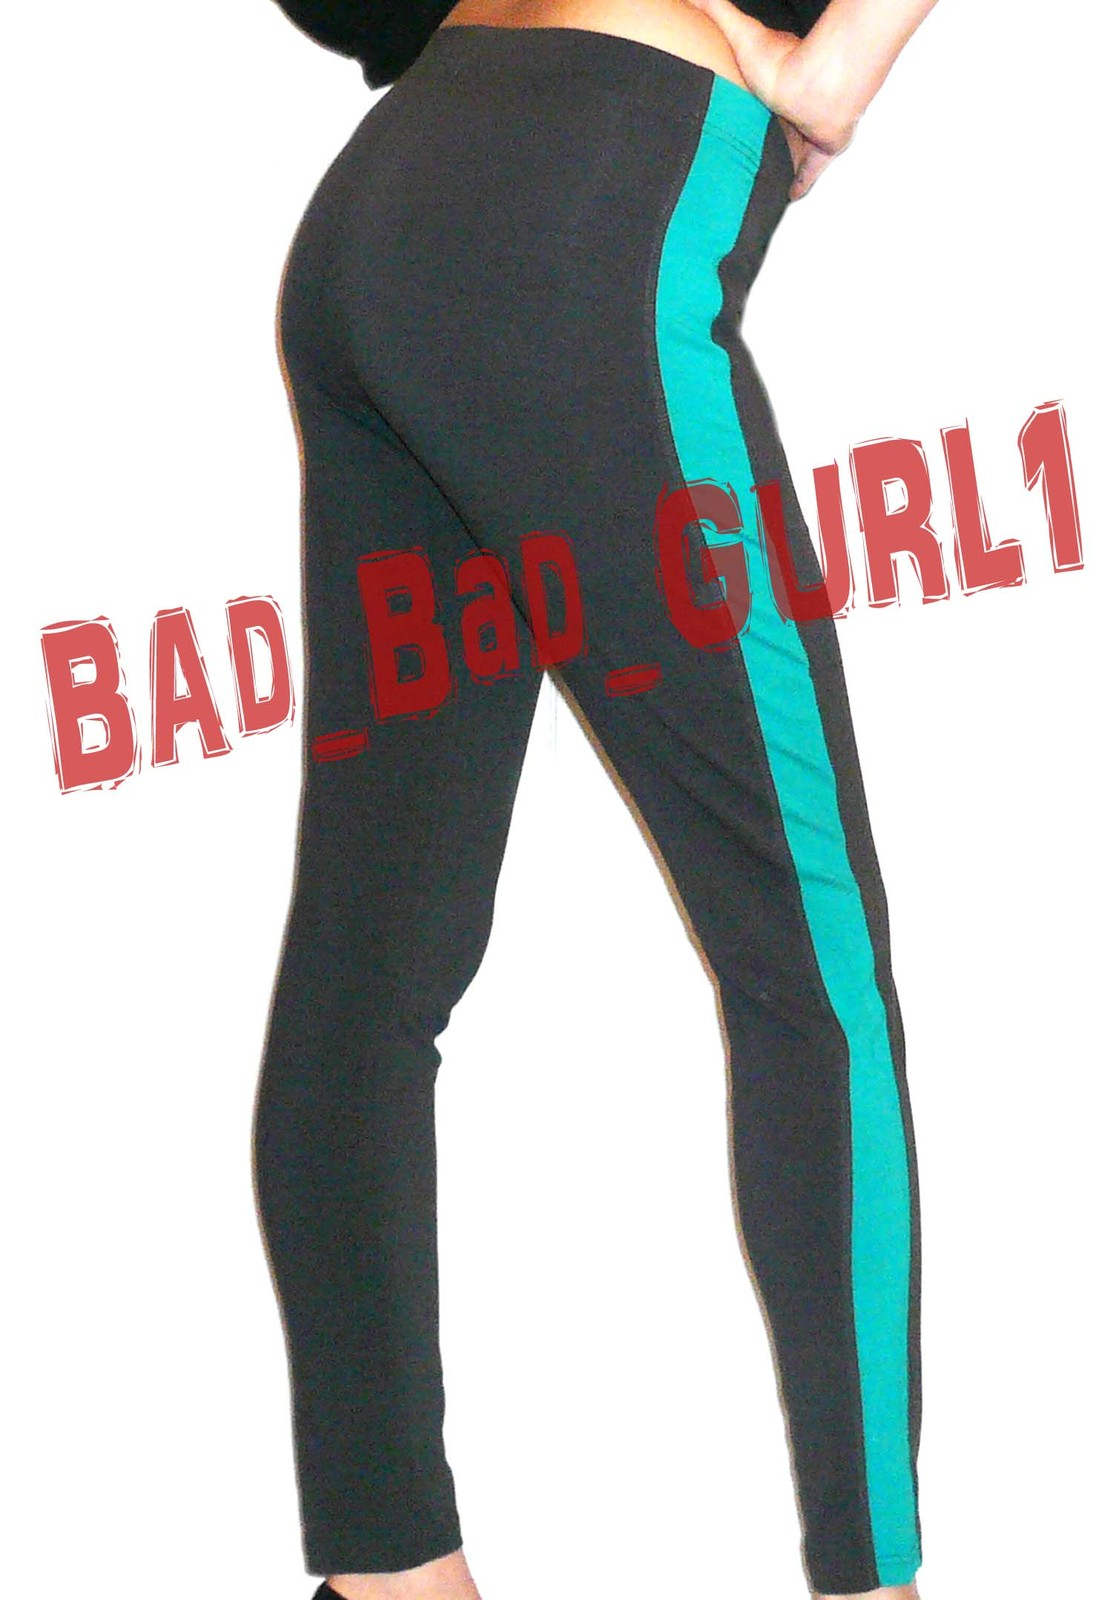 Forever21 Contrast Panel Colorblock Skinny Gym Leggings Athletic Jeggings Pants